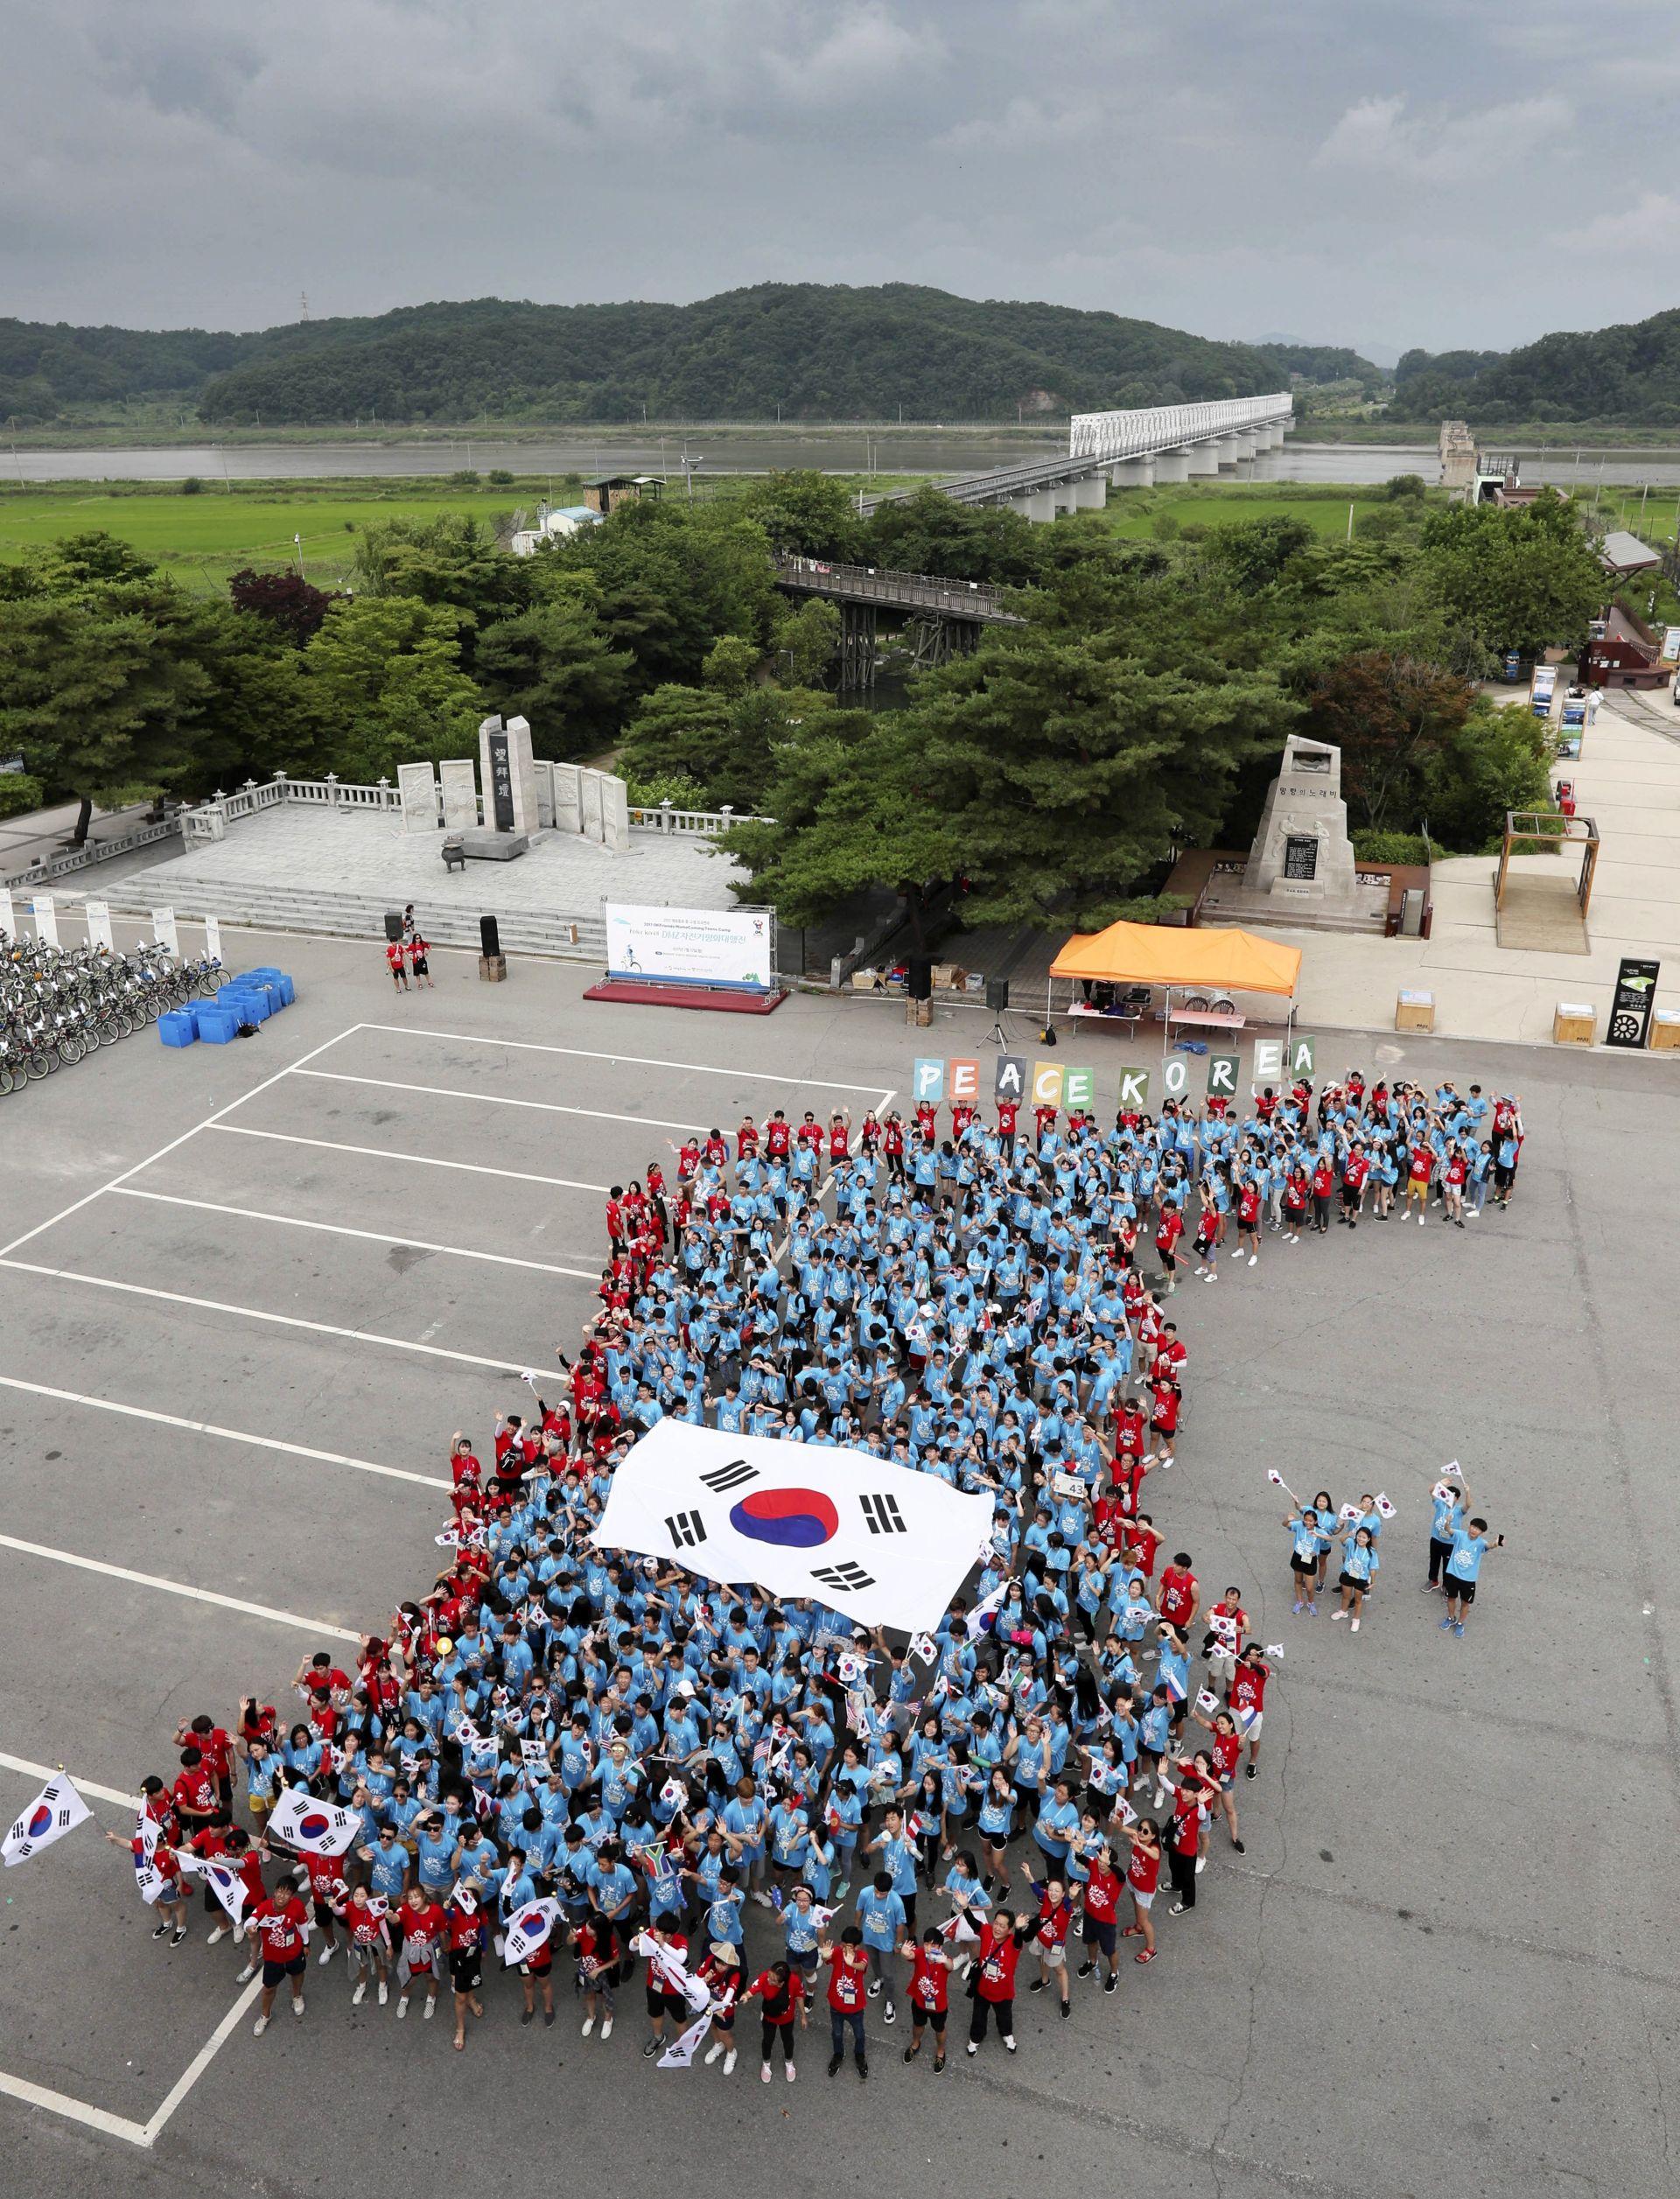 Južna Koreja predlaže nove pregovore sa Sjevernom Korejom